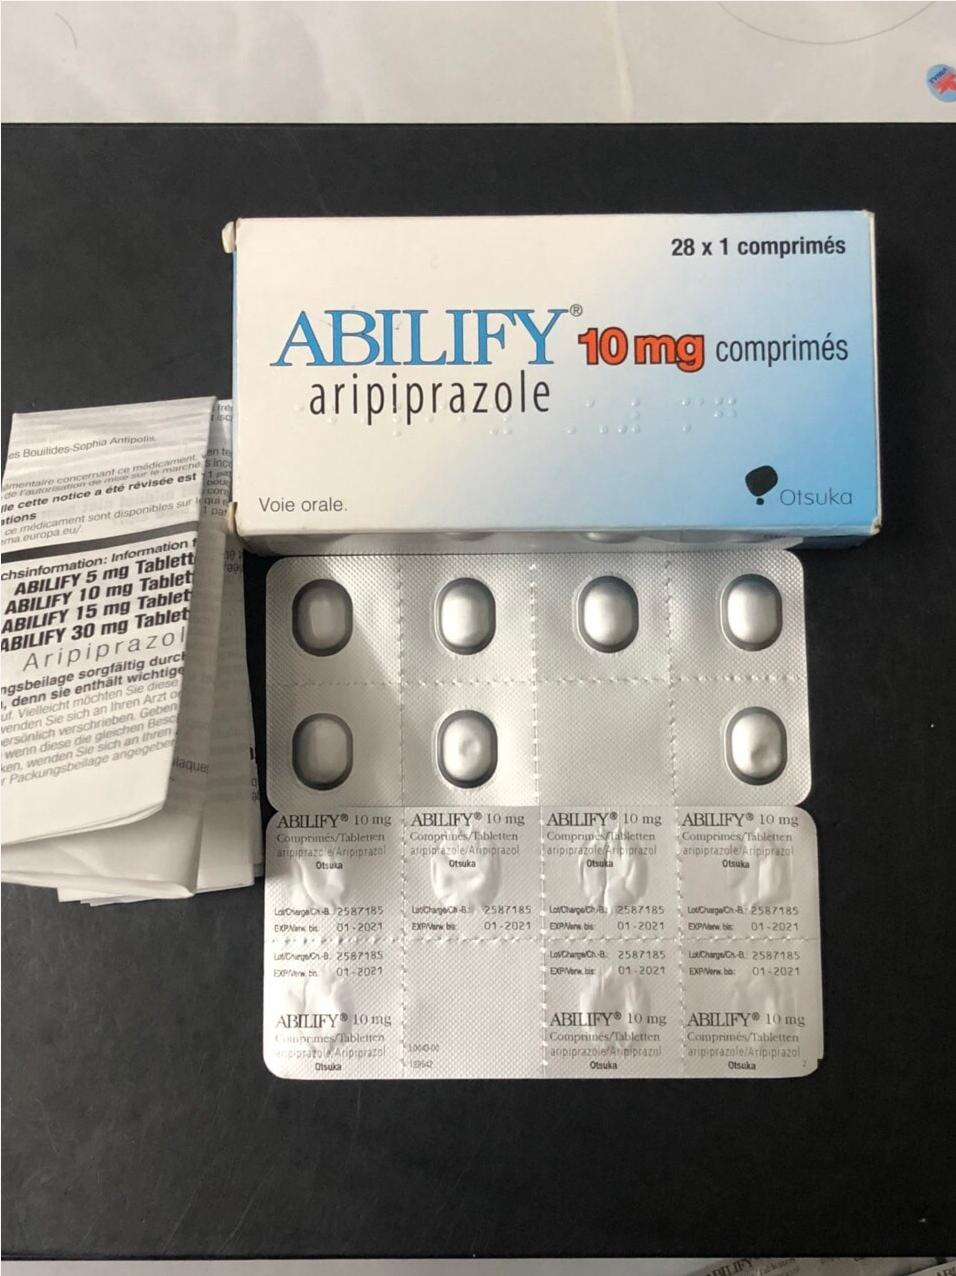 Thuốc Abilify Aripiprazole 5mg giá bao nhiêu mua ở đâu?